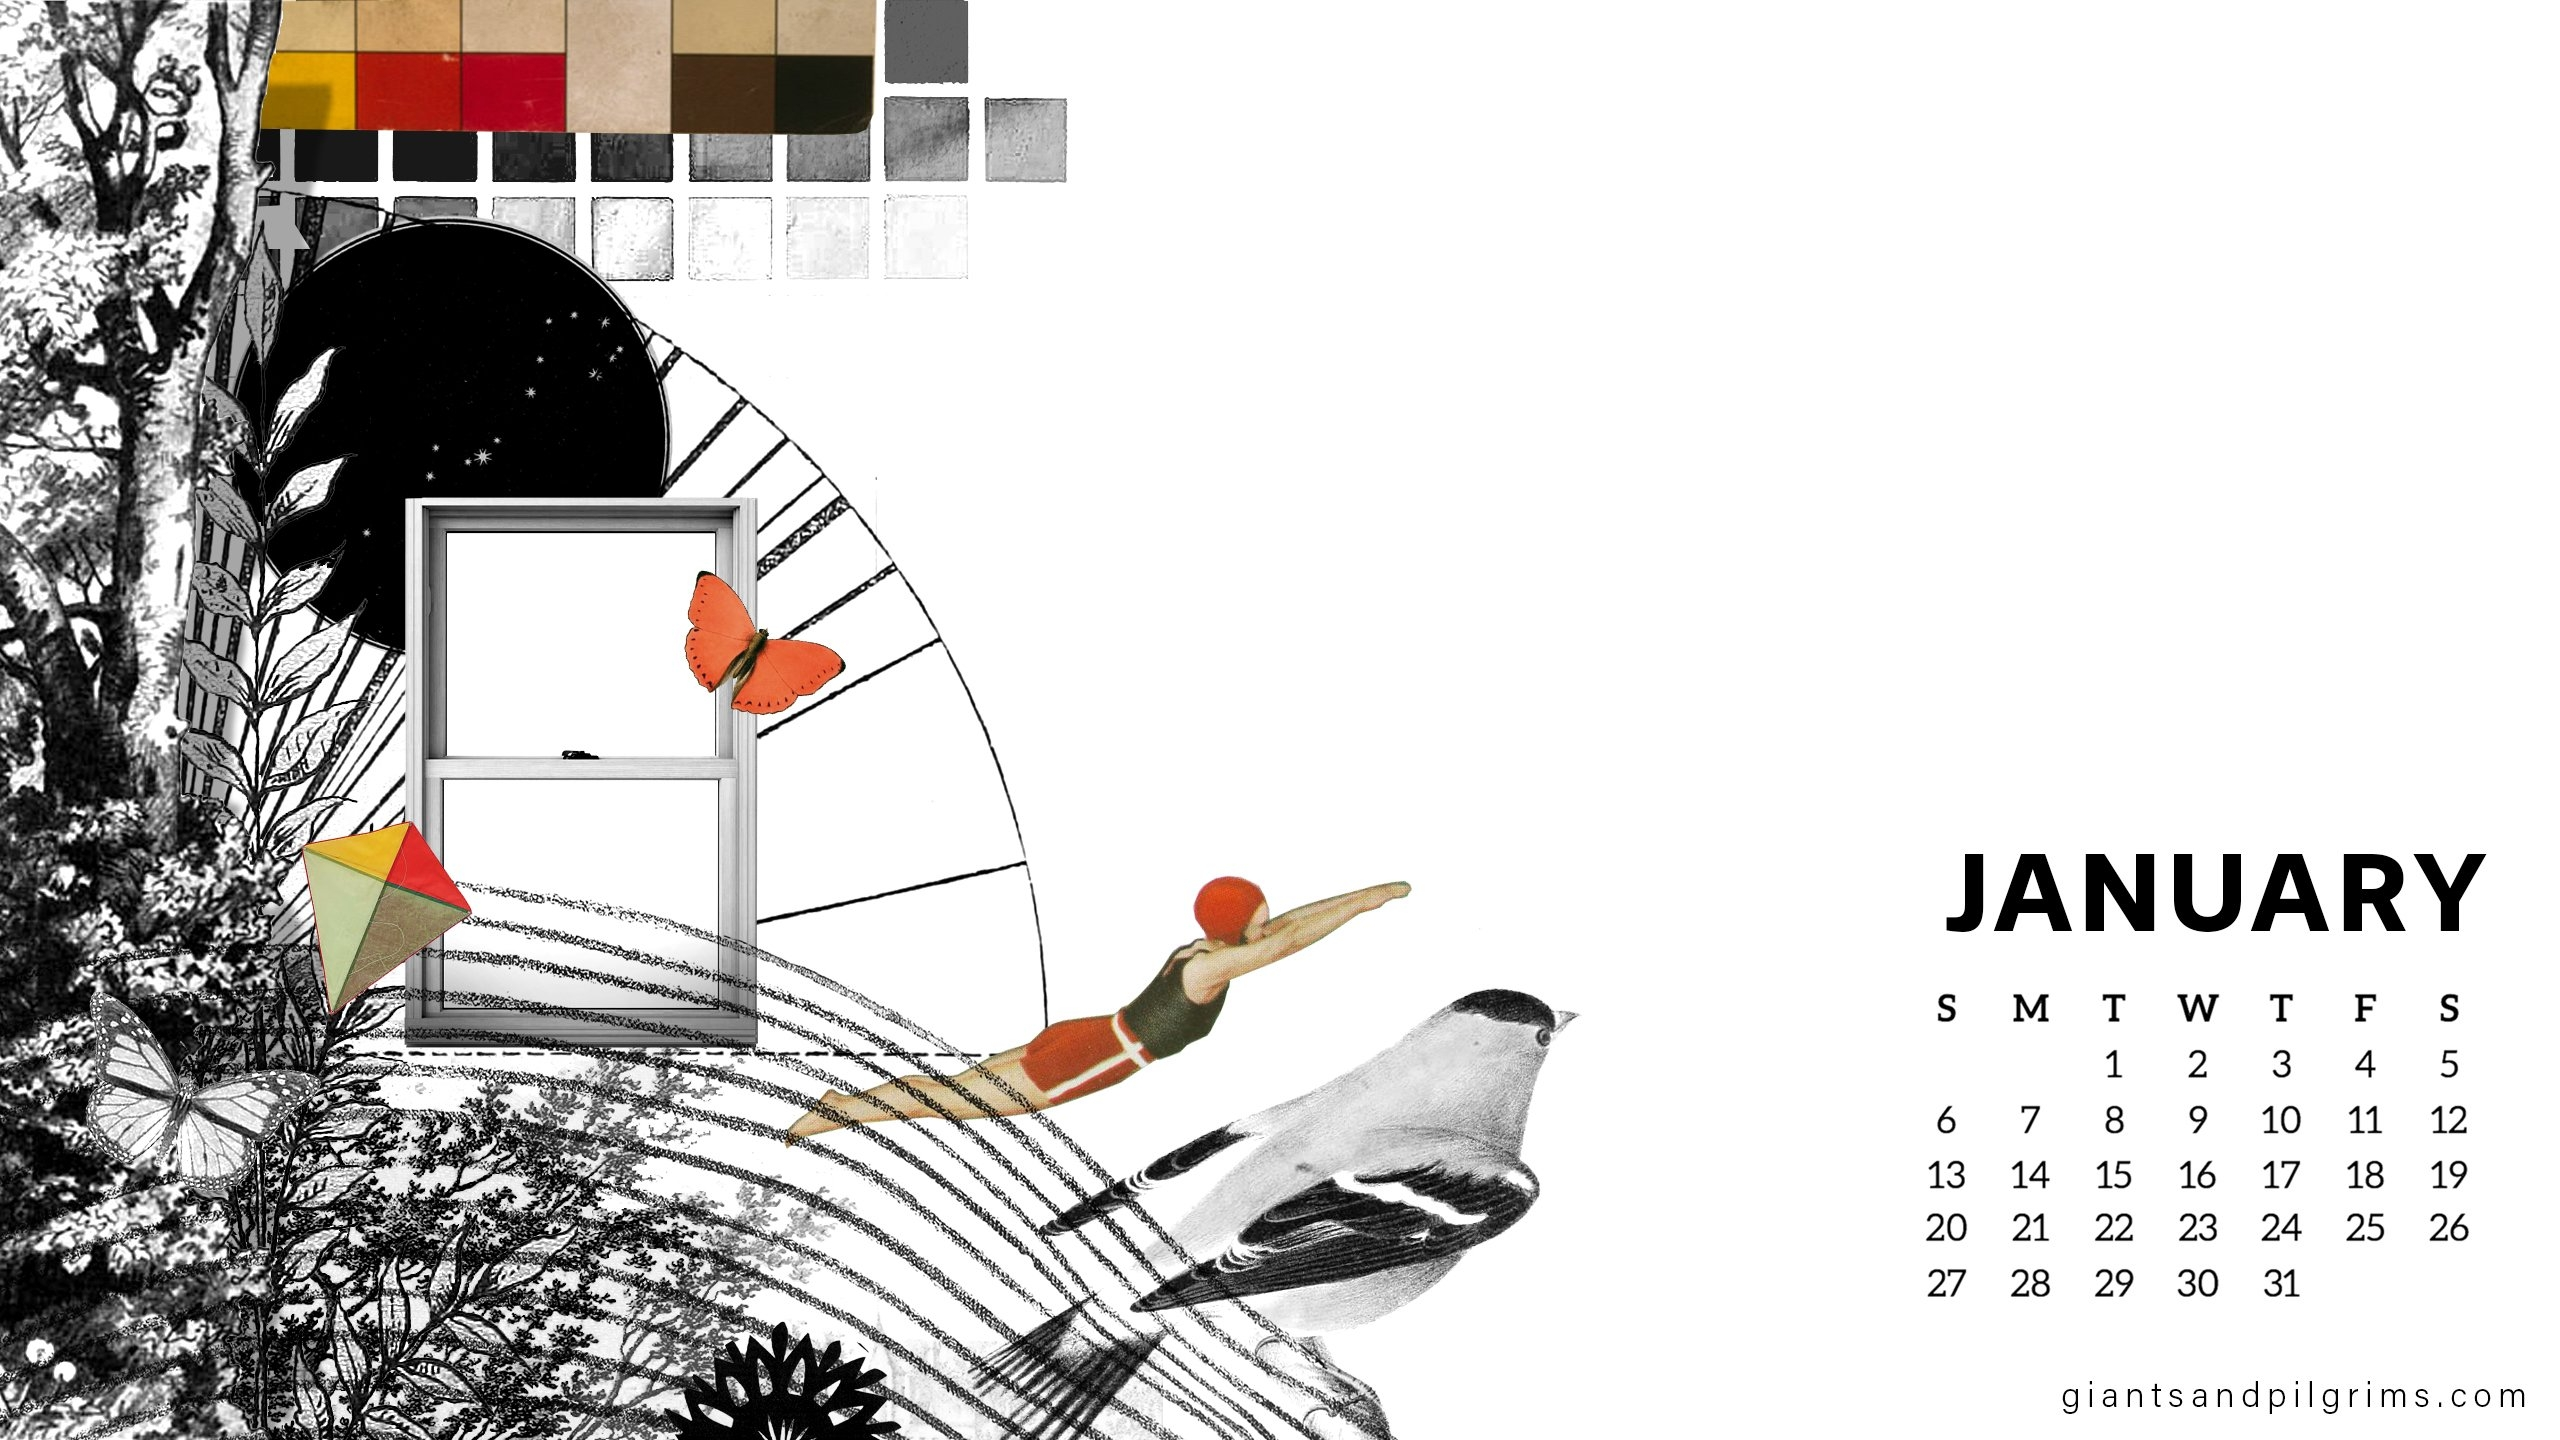 January 2019 Free Desktop And Iphone Wallpaper – Giants & Pilgrims Calendar 2019 On My Iphone